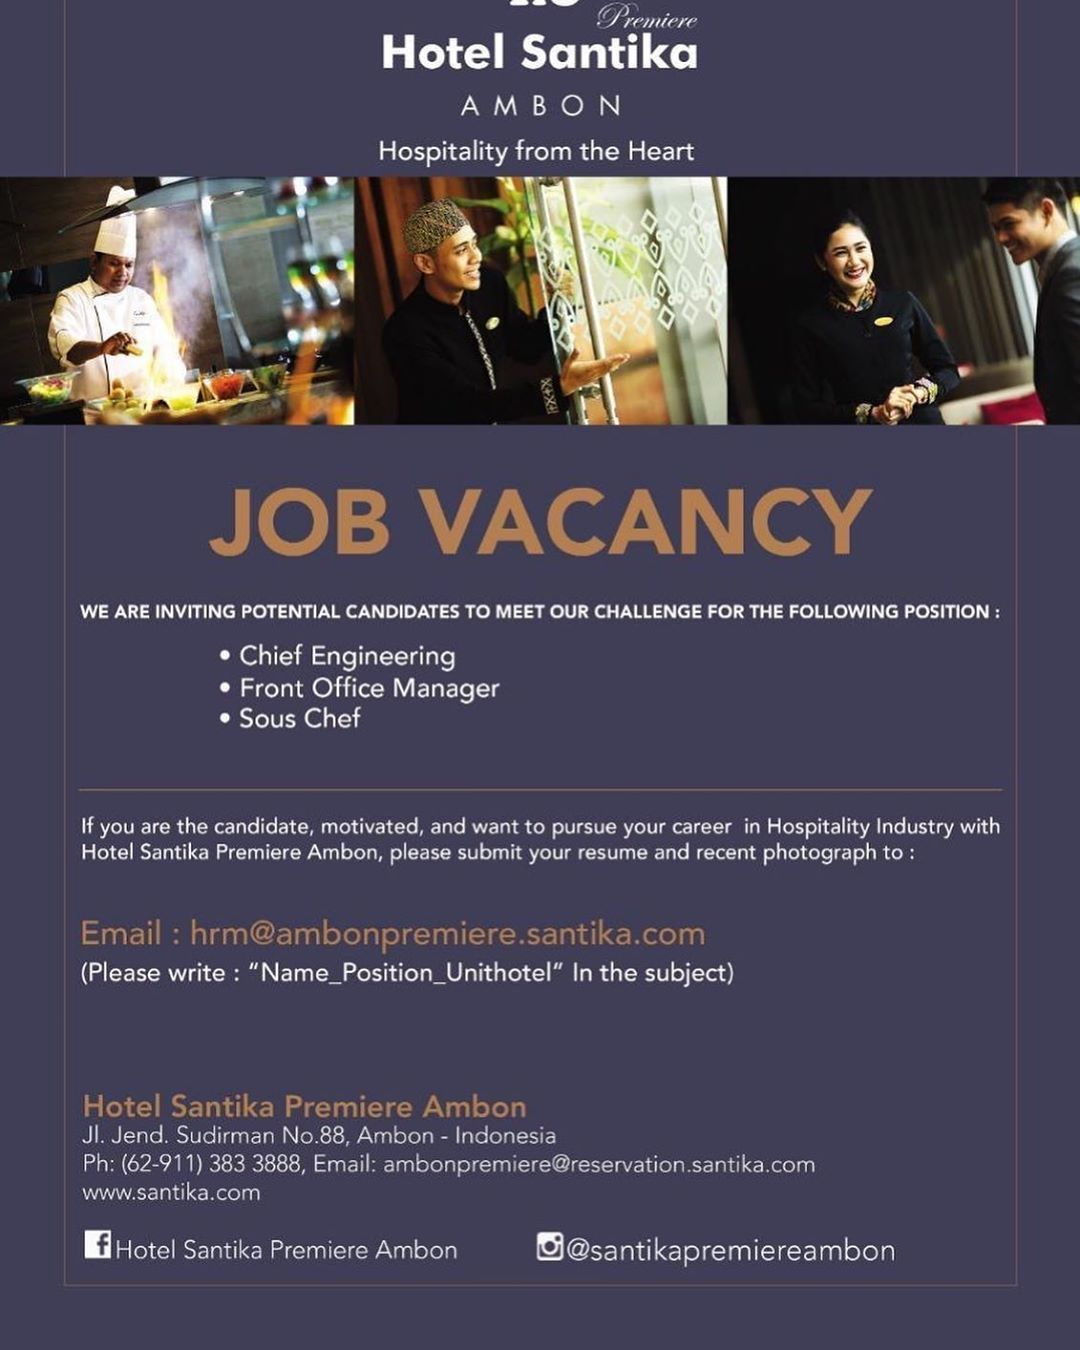 Job Jobs Jobsearch Jobshiring Jobsinterview Jobseeker